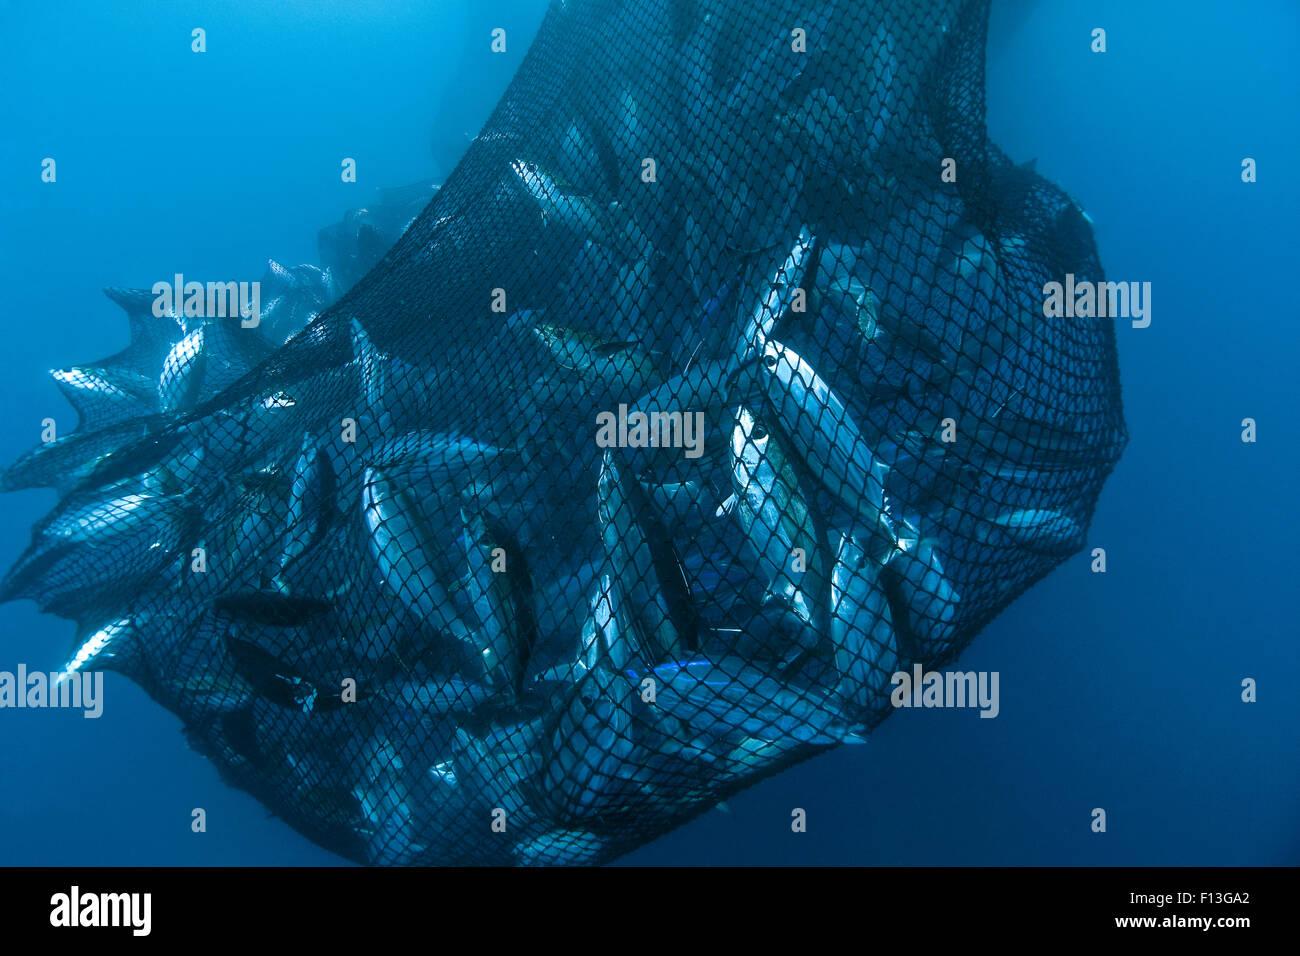 Drag net of a seine fishing vessel full of yellowfin tuna for Drag net fishing